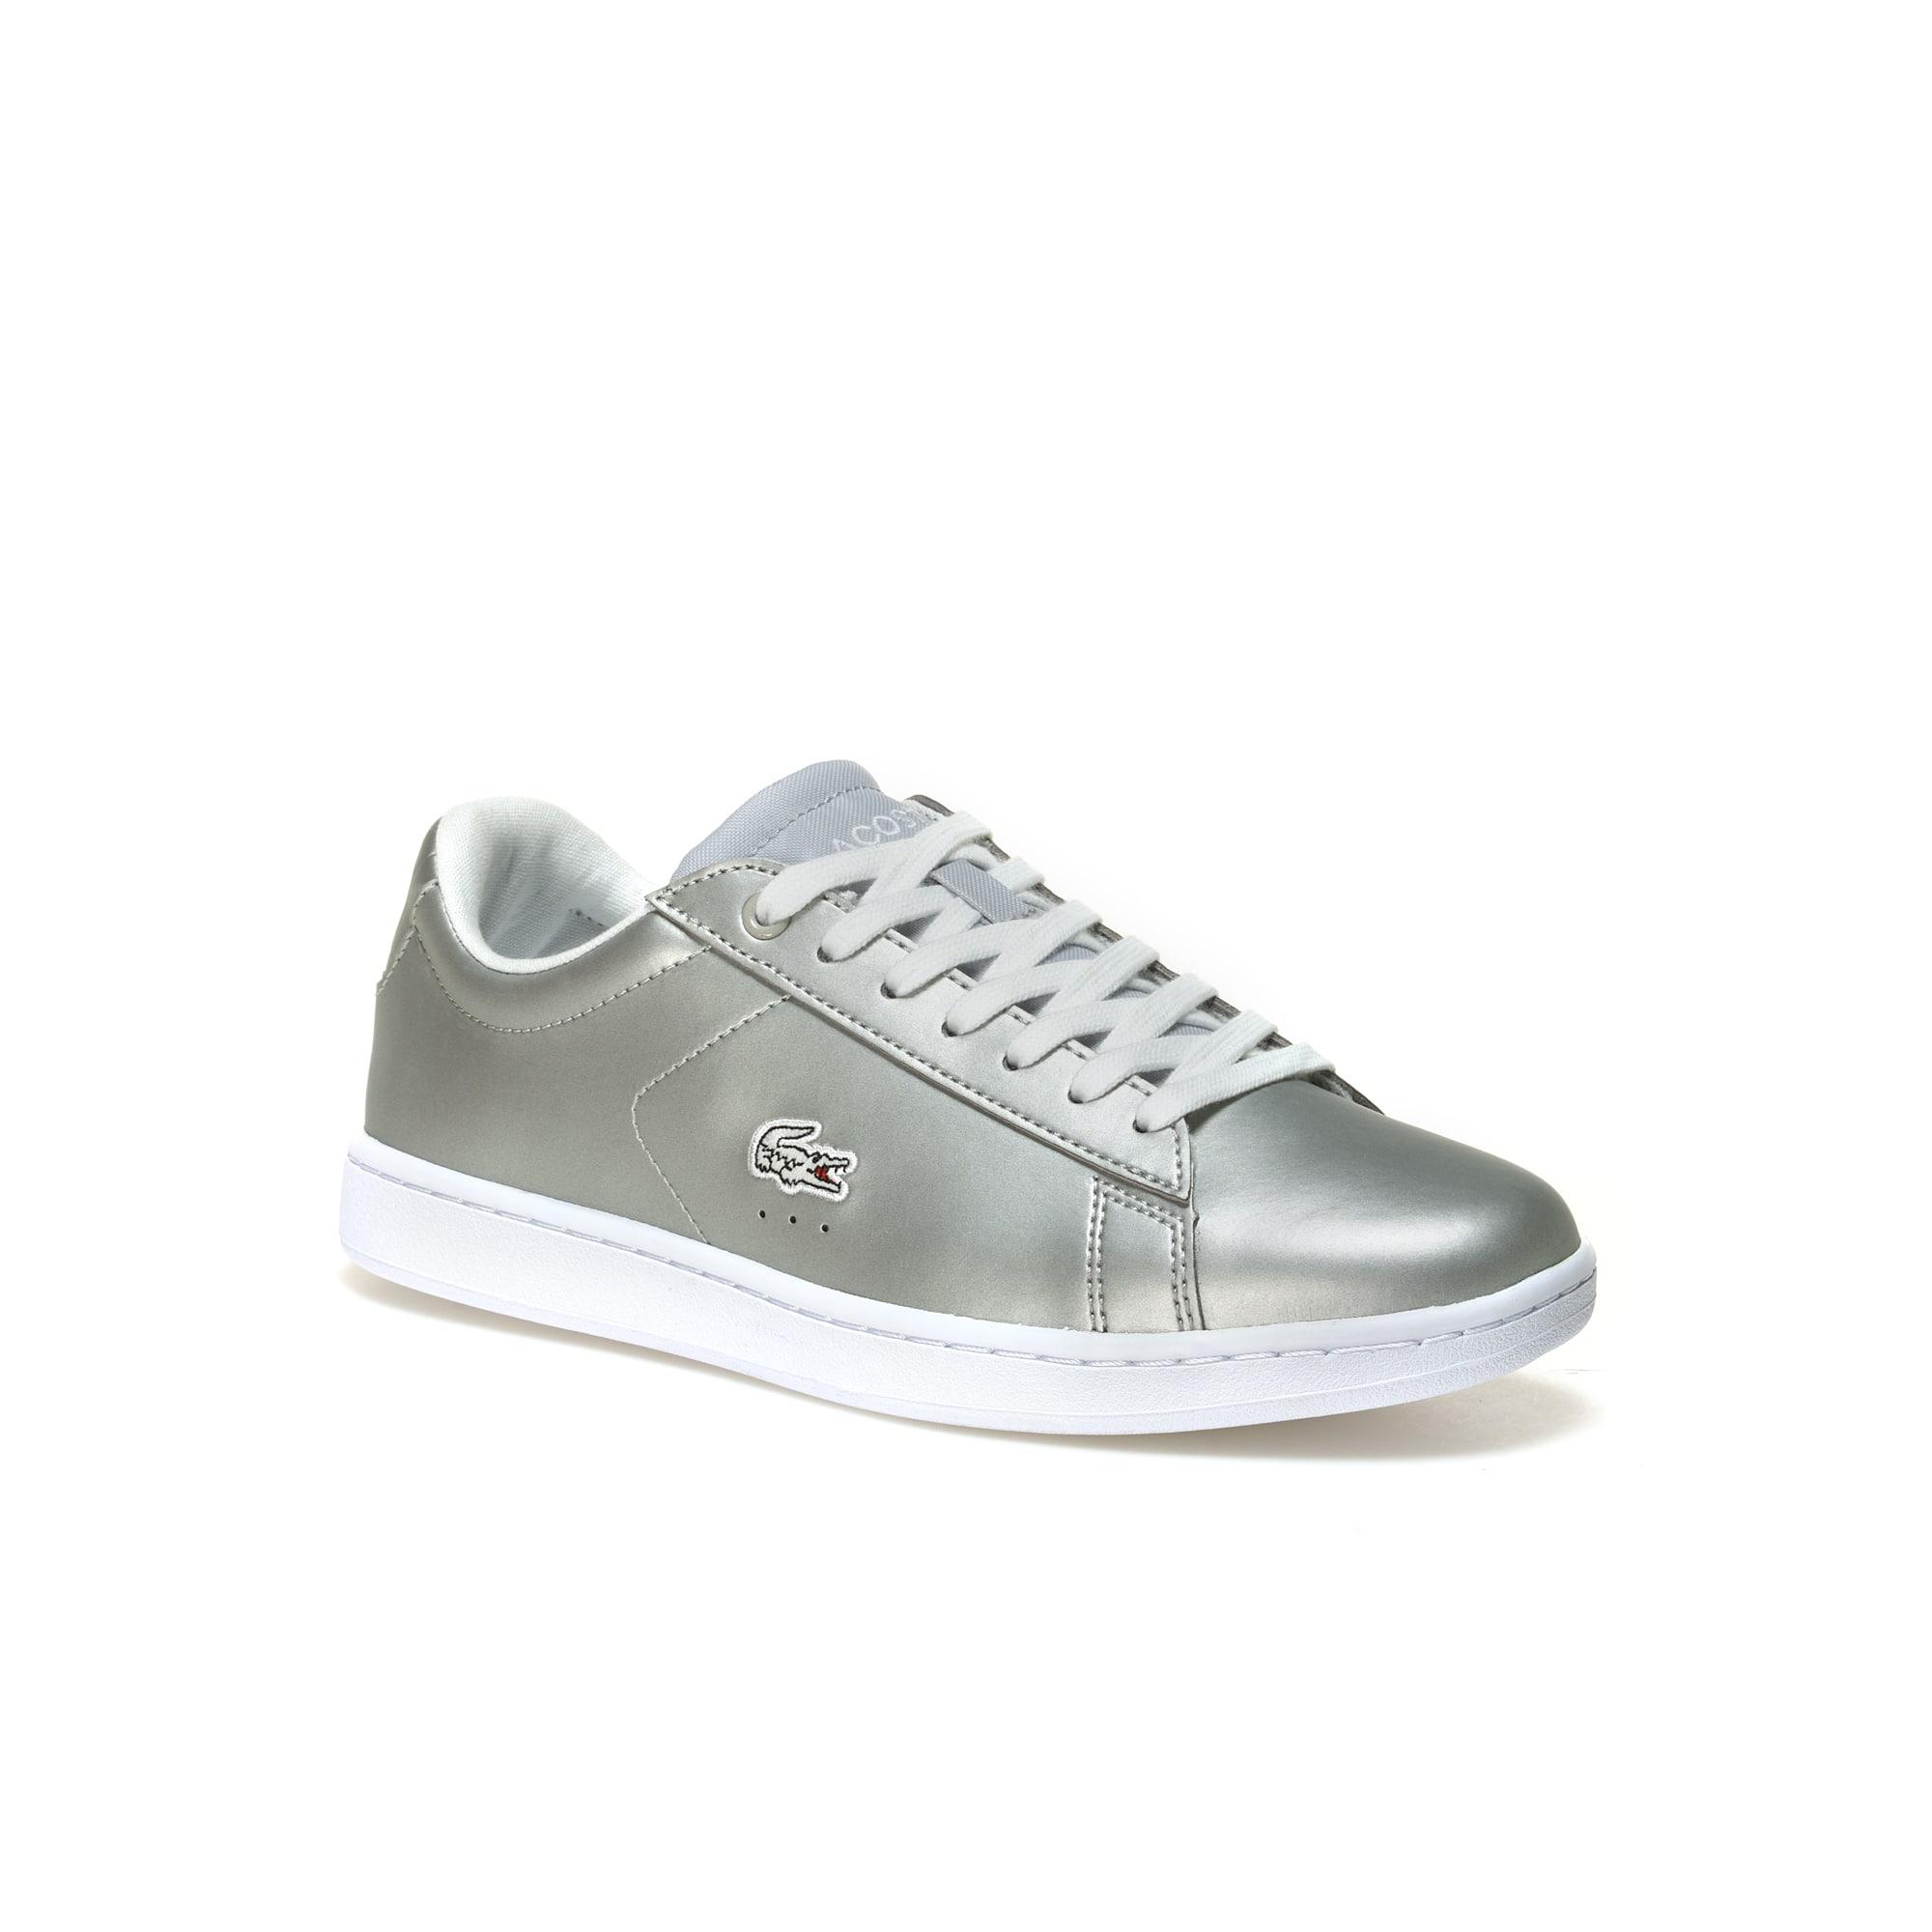 Women's Carnaby Evo Metallic Sneakers